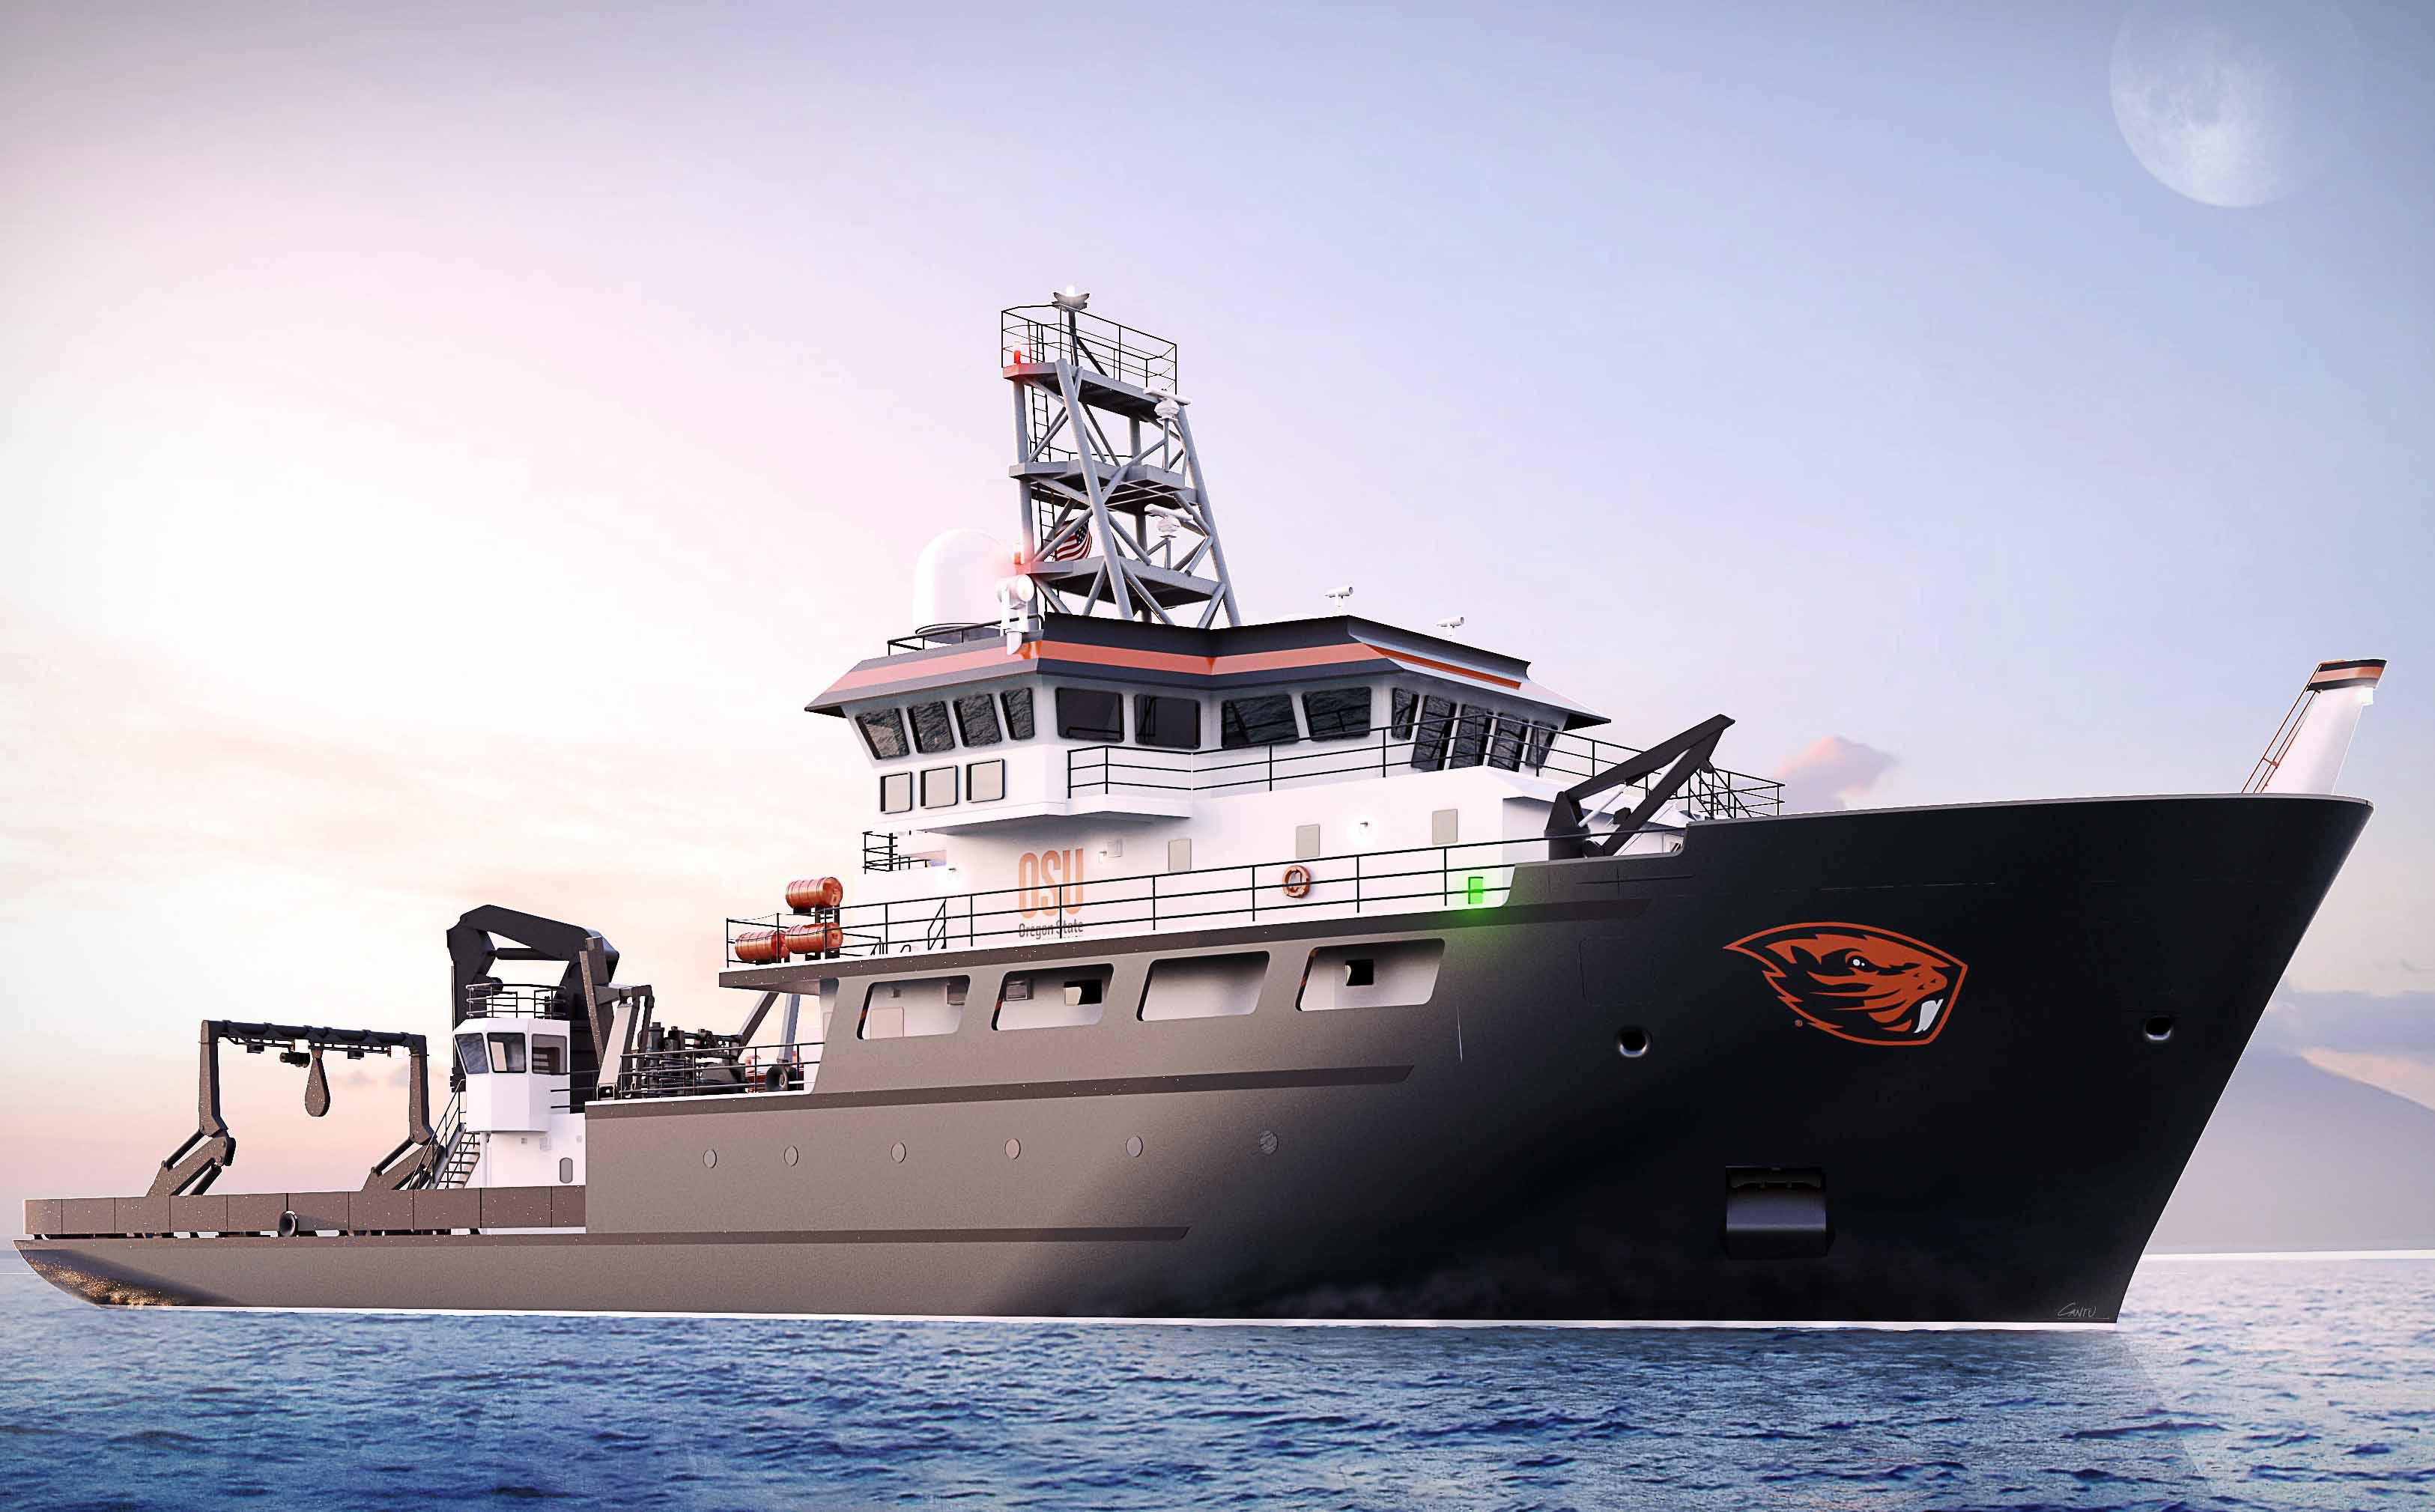 "US Forschungsschiff ""RCRV Taani"" mit HAMANN Abwassermanagementsystem"